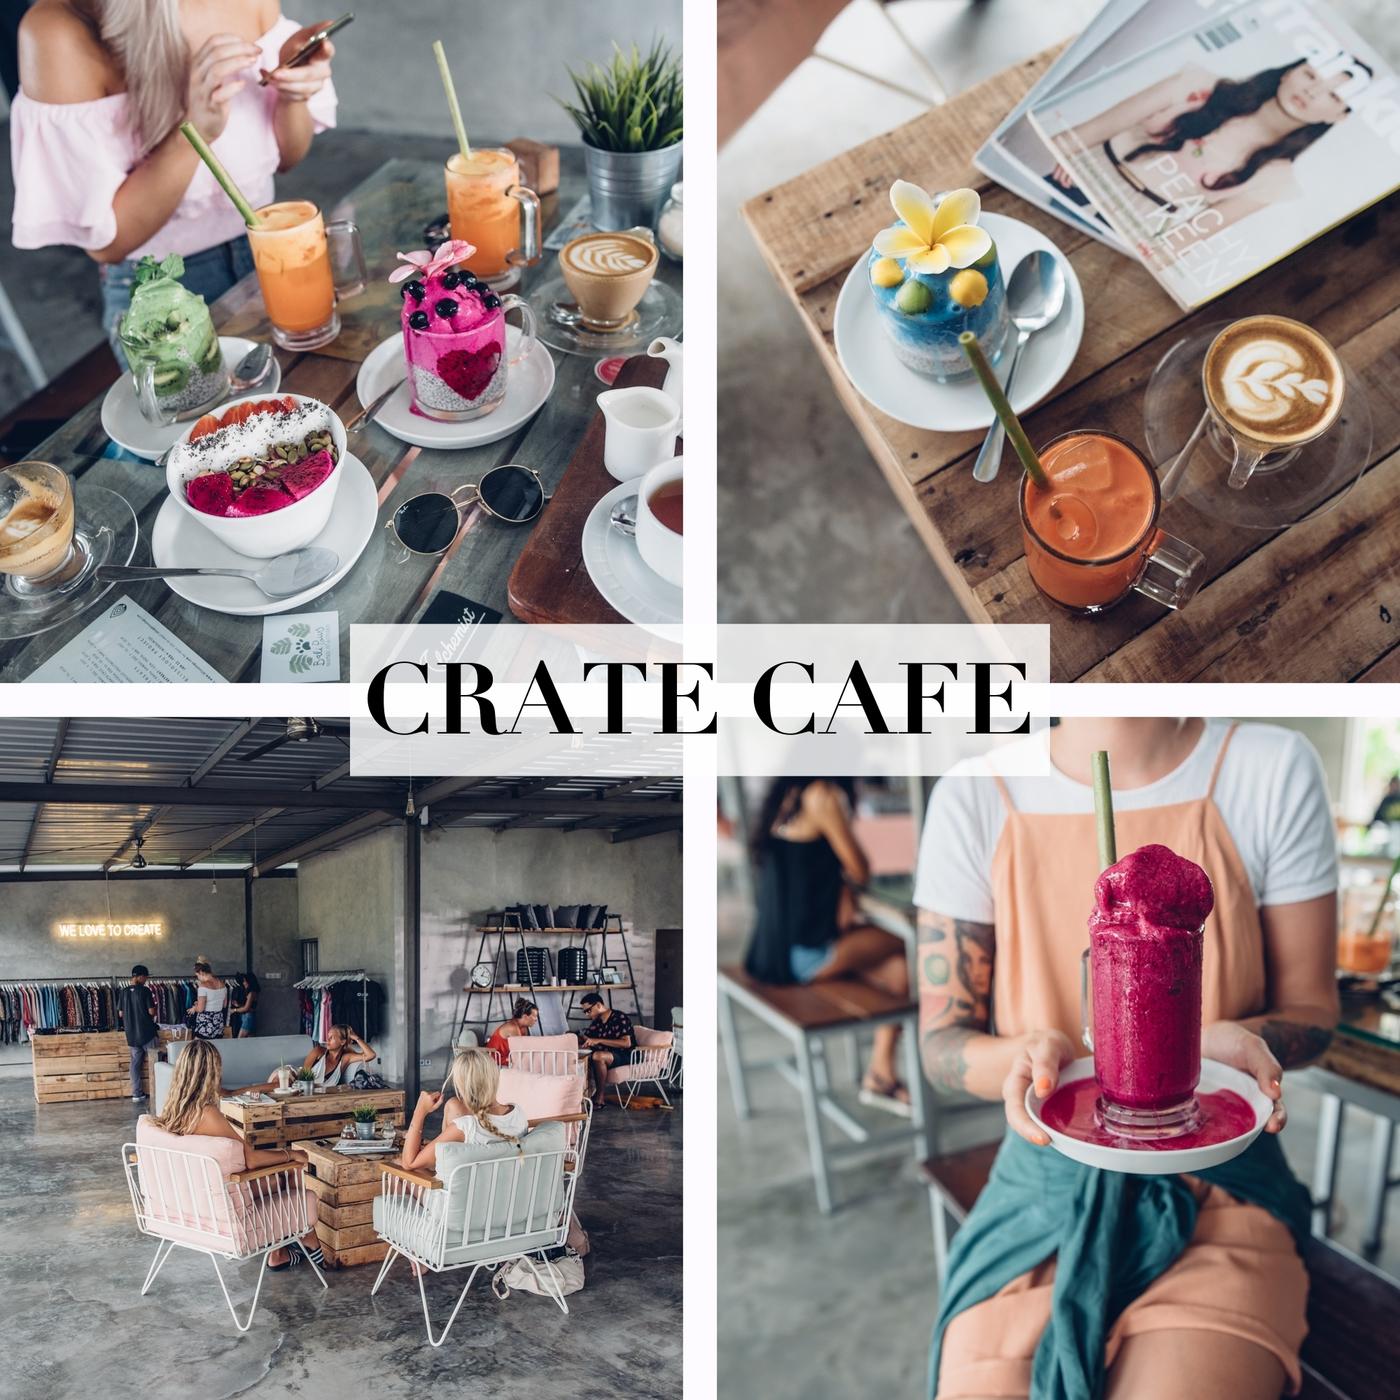 CRATE CAFE BALI-2.jpg